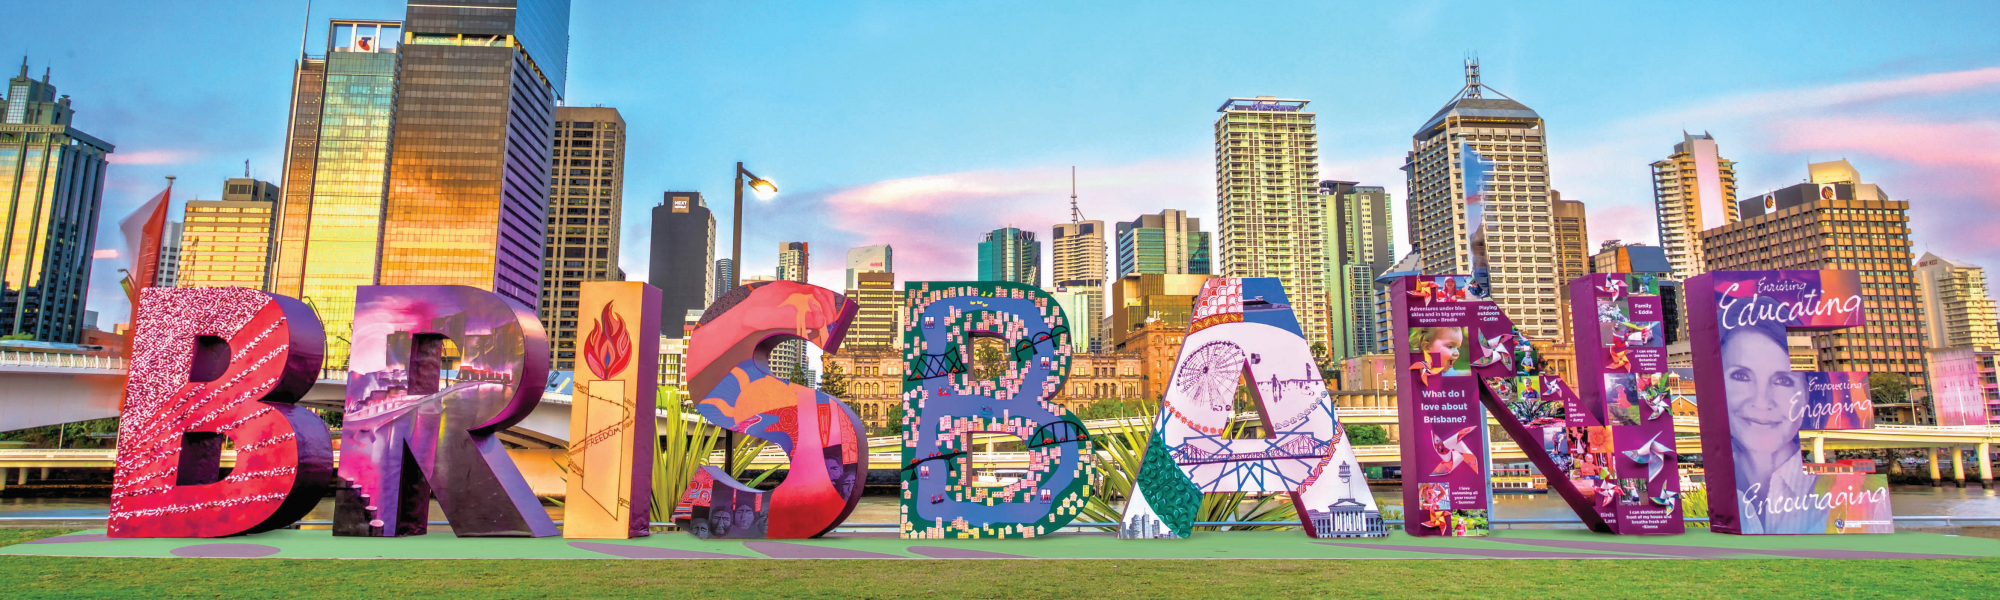 Brisbane-Sign